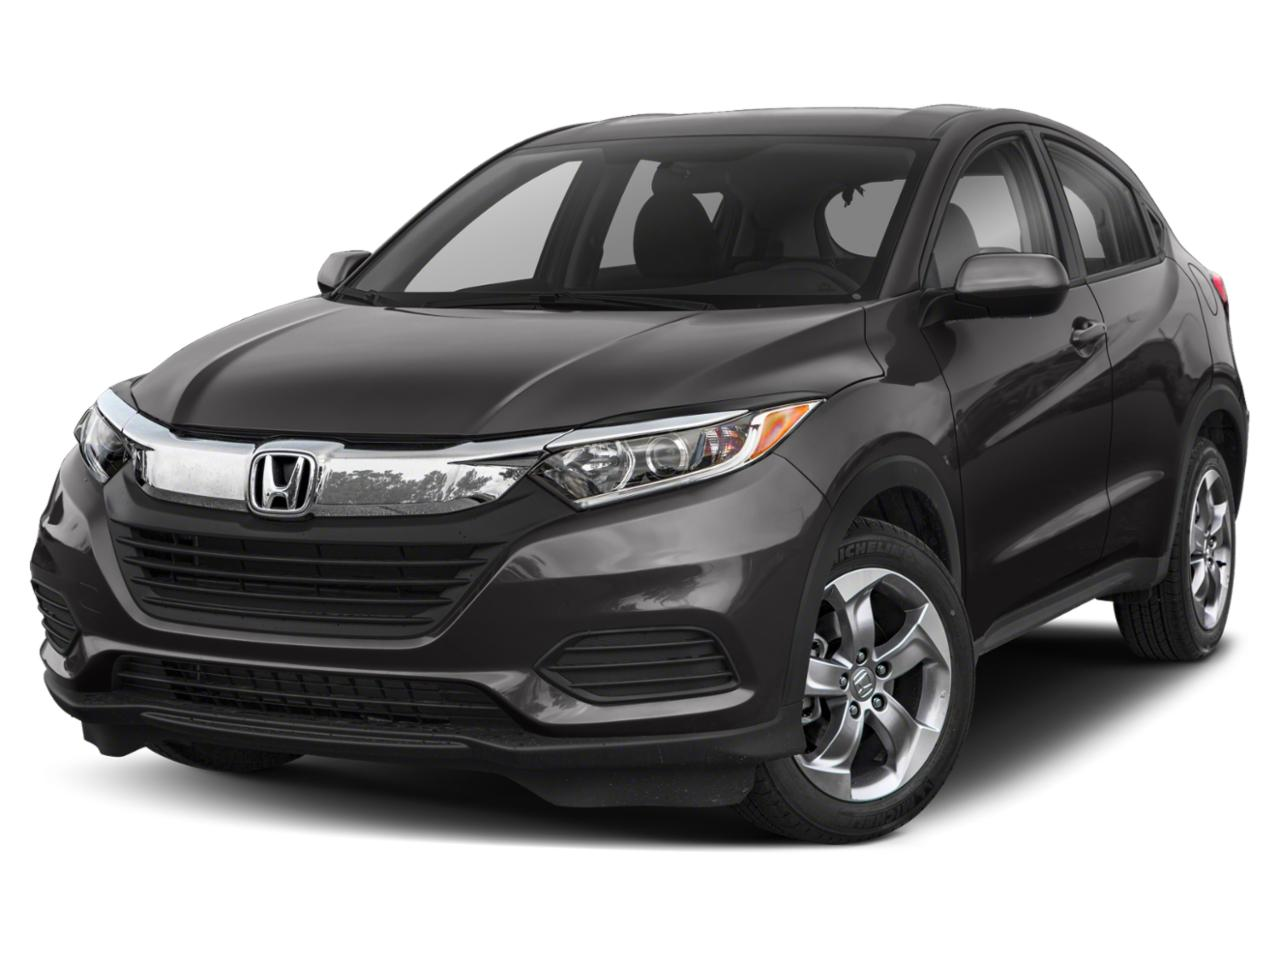 2019 Honda HR-V Vehicle Photo in Plainfield, IL 60586